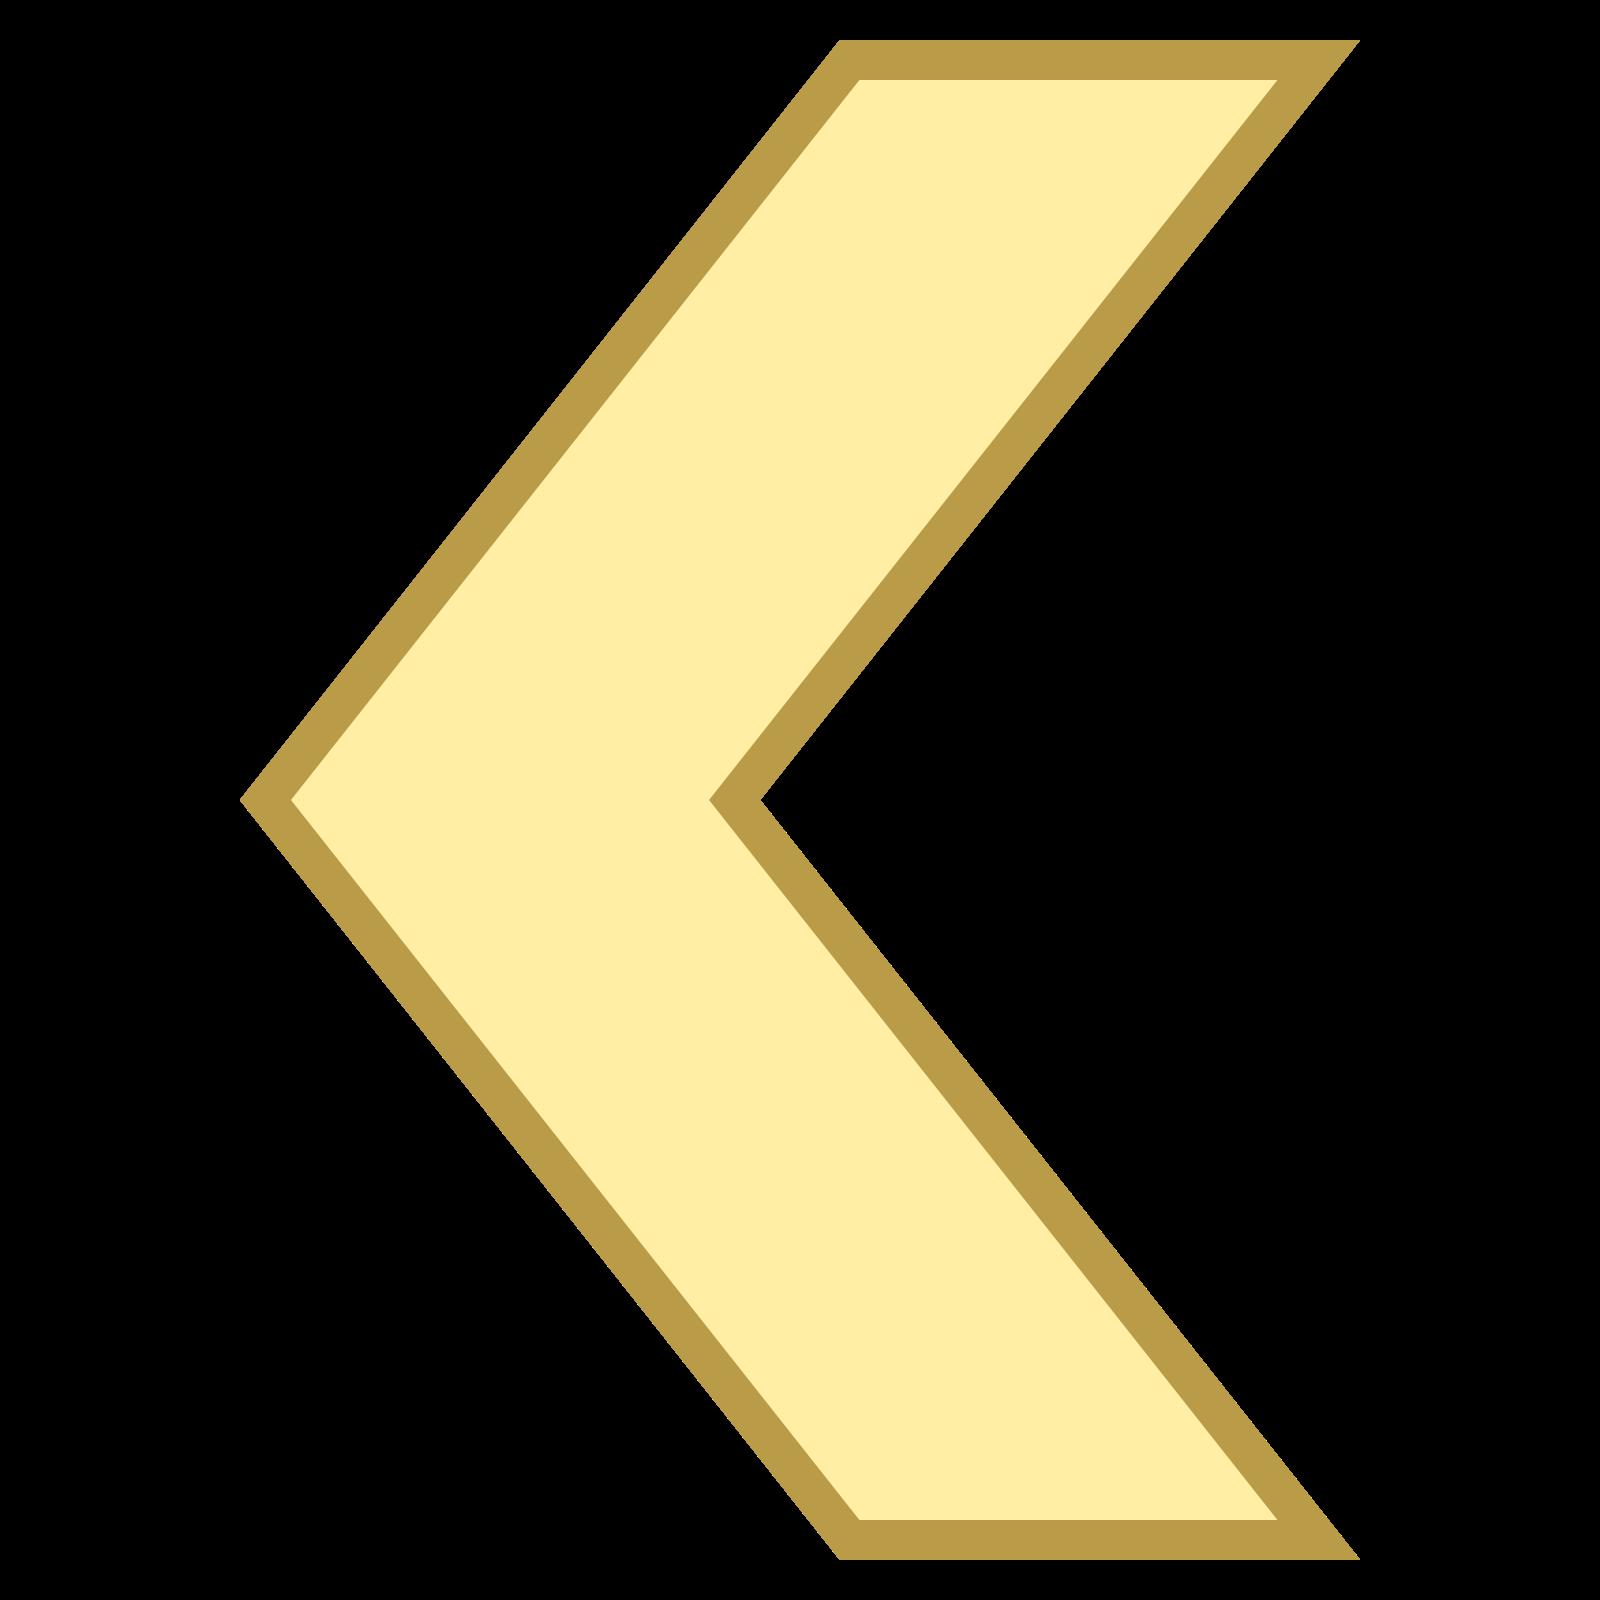 Galón izquierdo icon